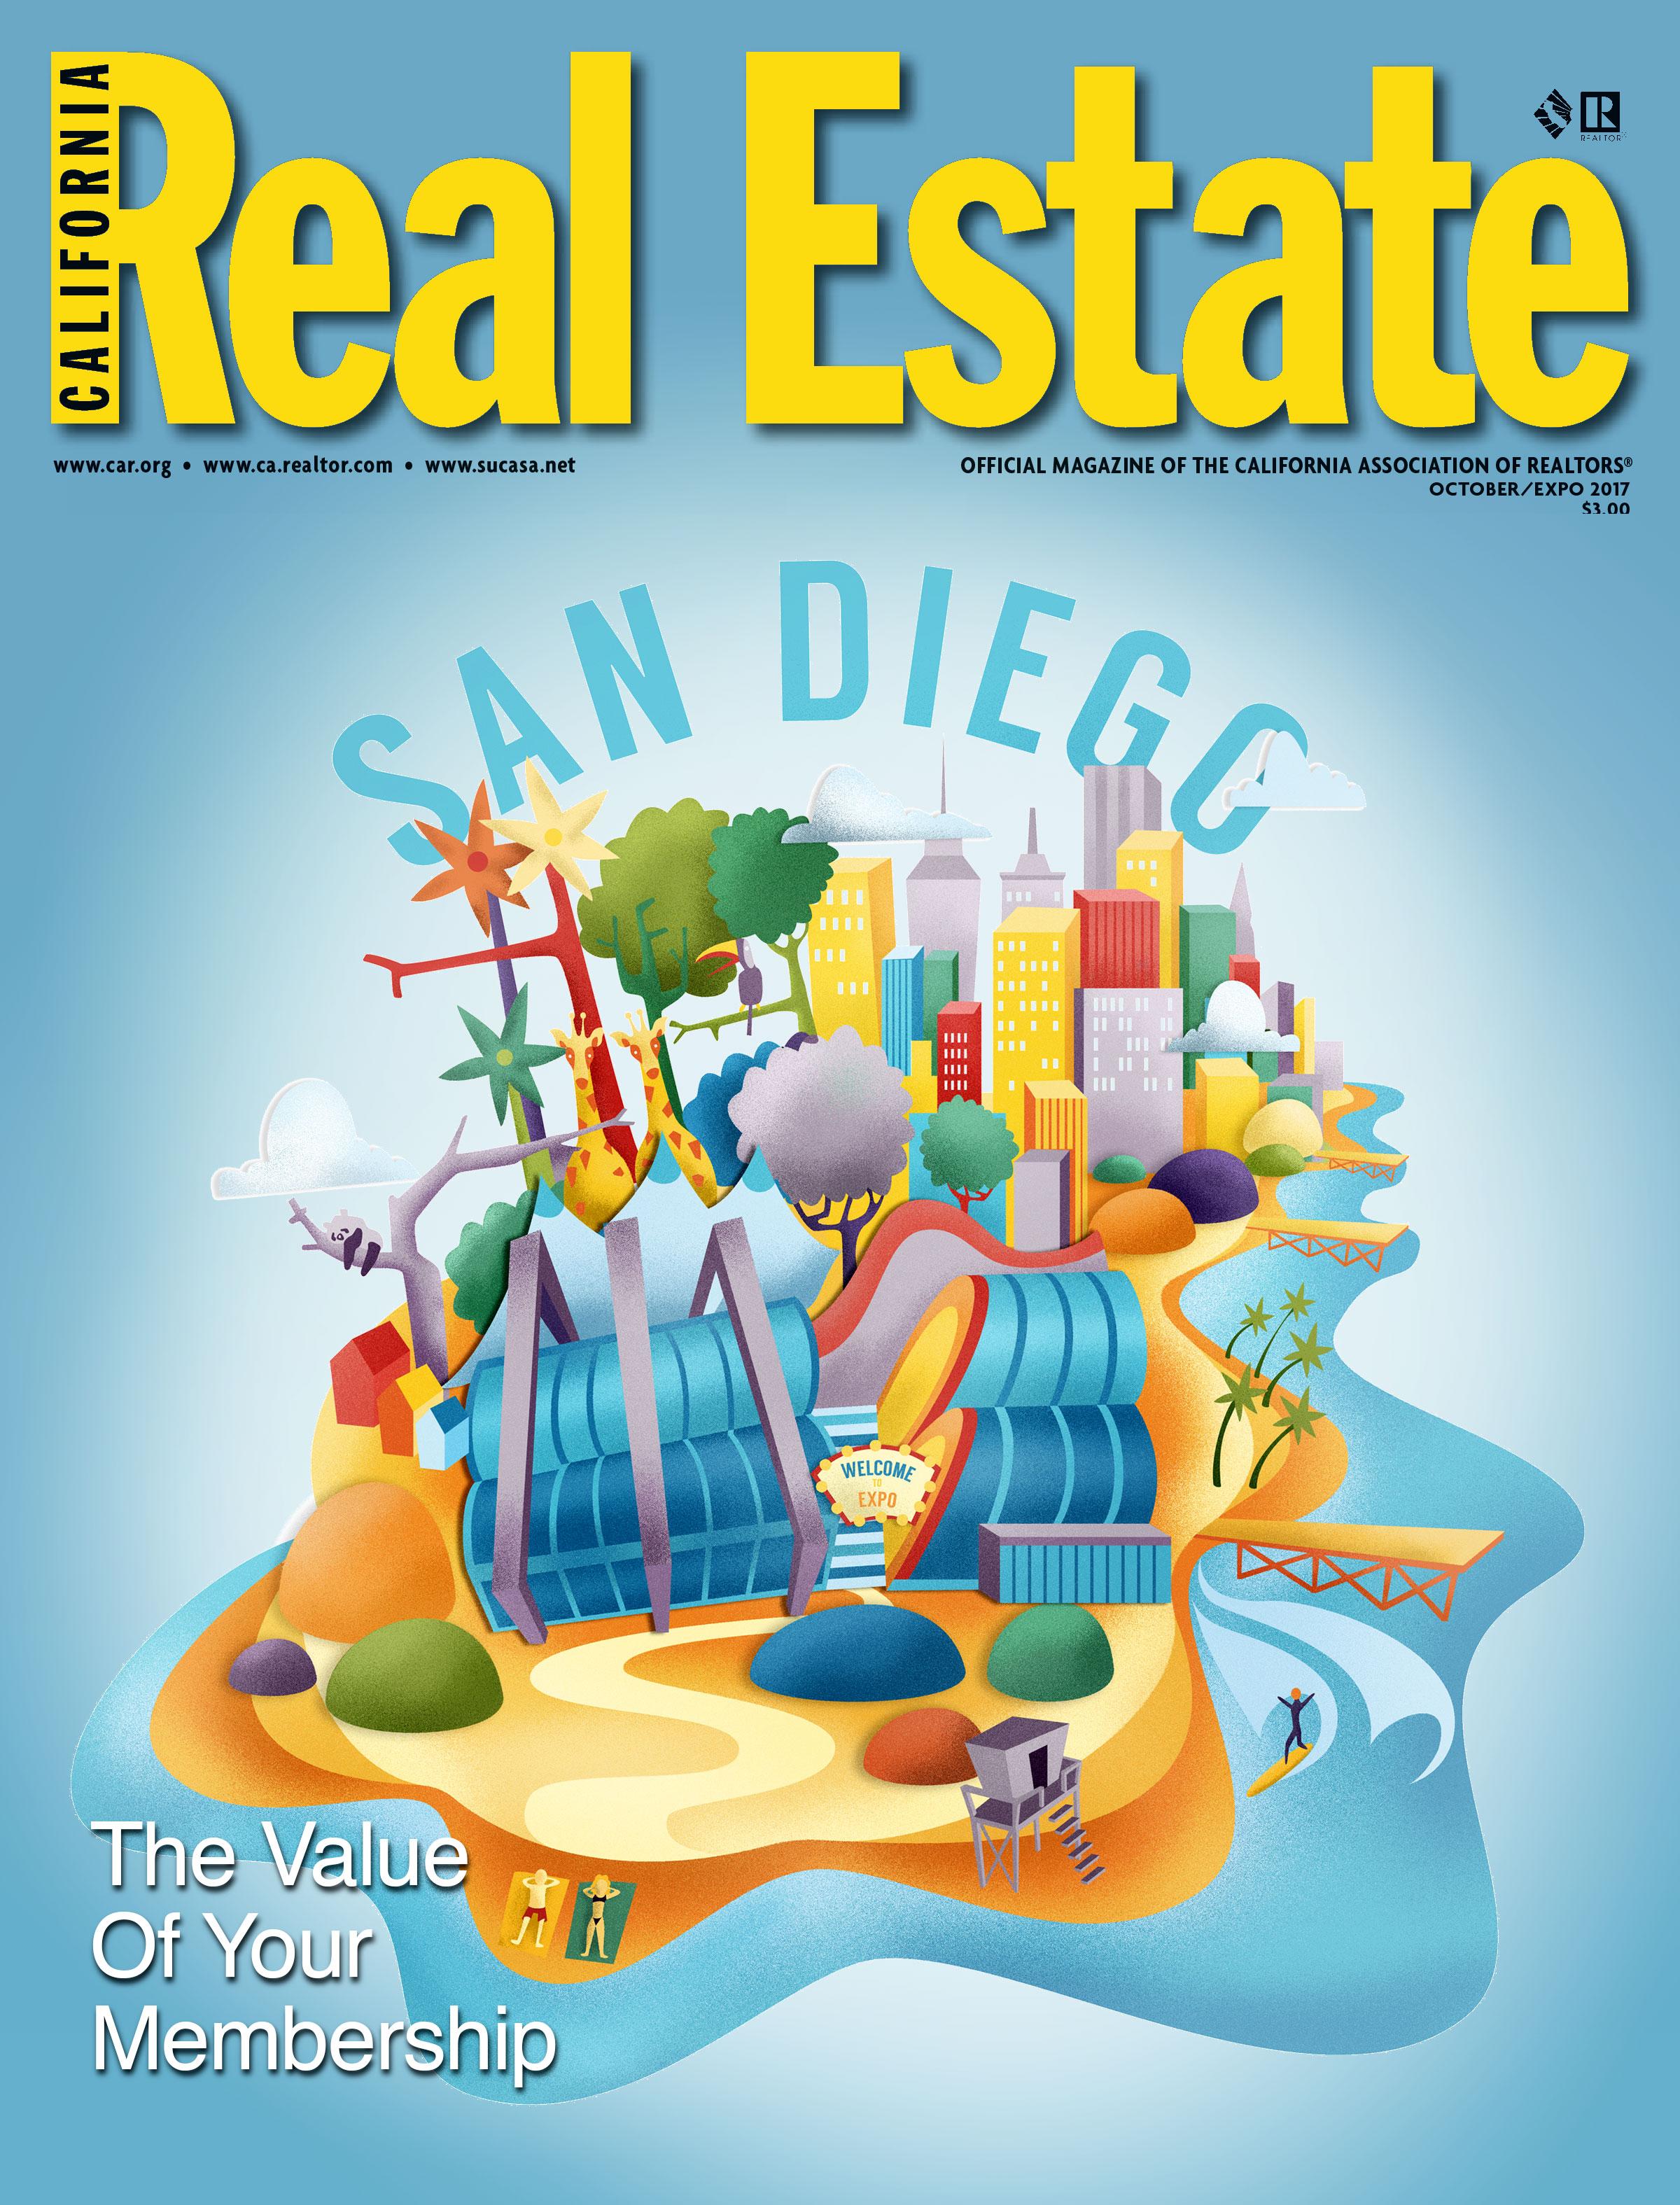 Reddin-Designs-Californian-real-estate-cover-.jpg